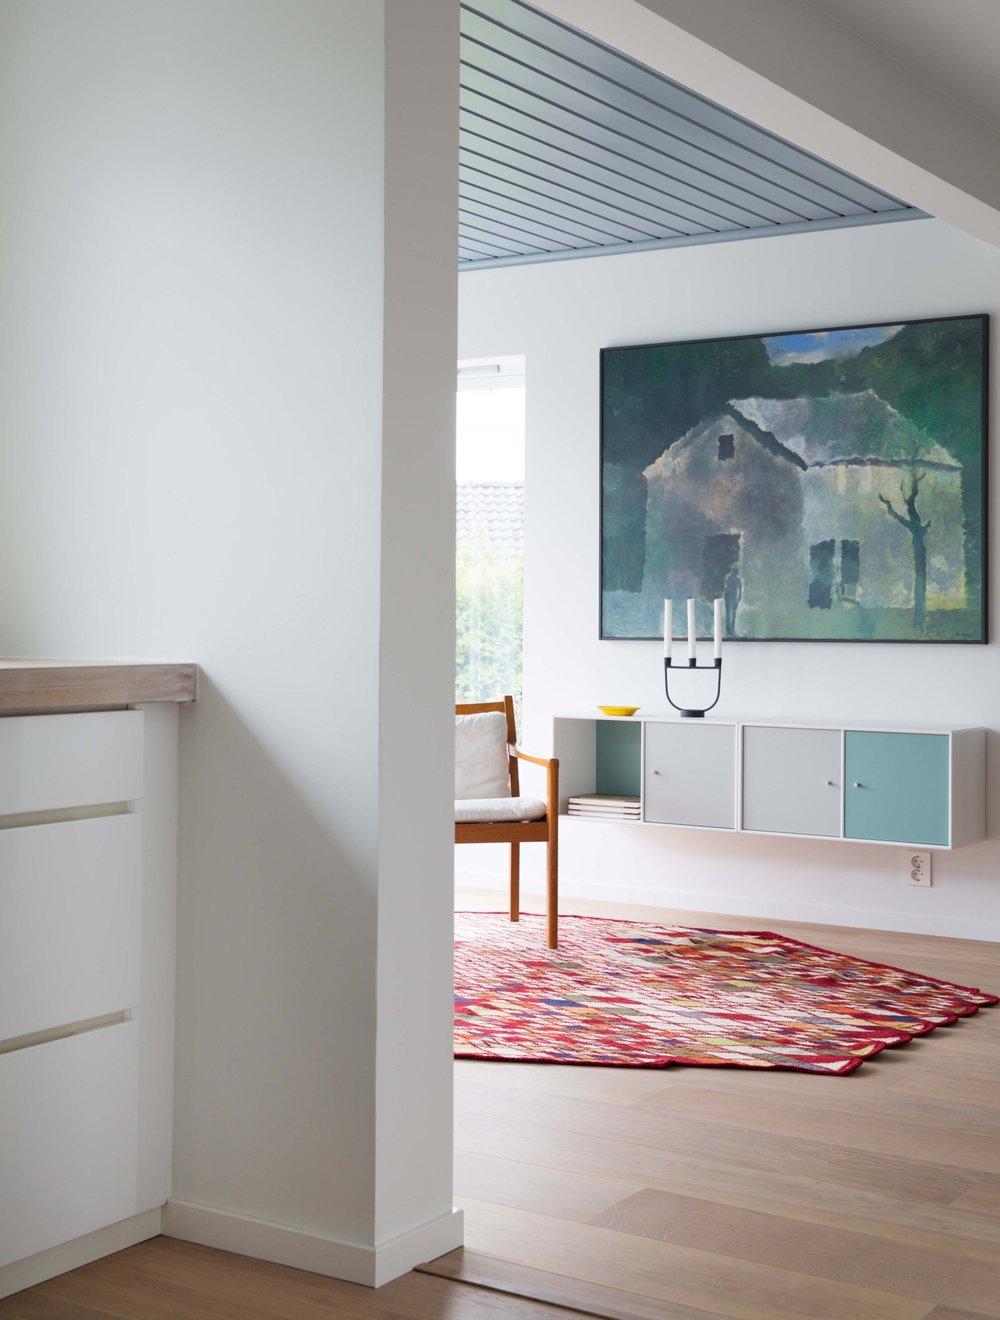 Nyfelt_og_Strand_interiørarkitekter_enebolig_nøtterøy_web02.jpg